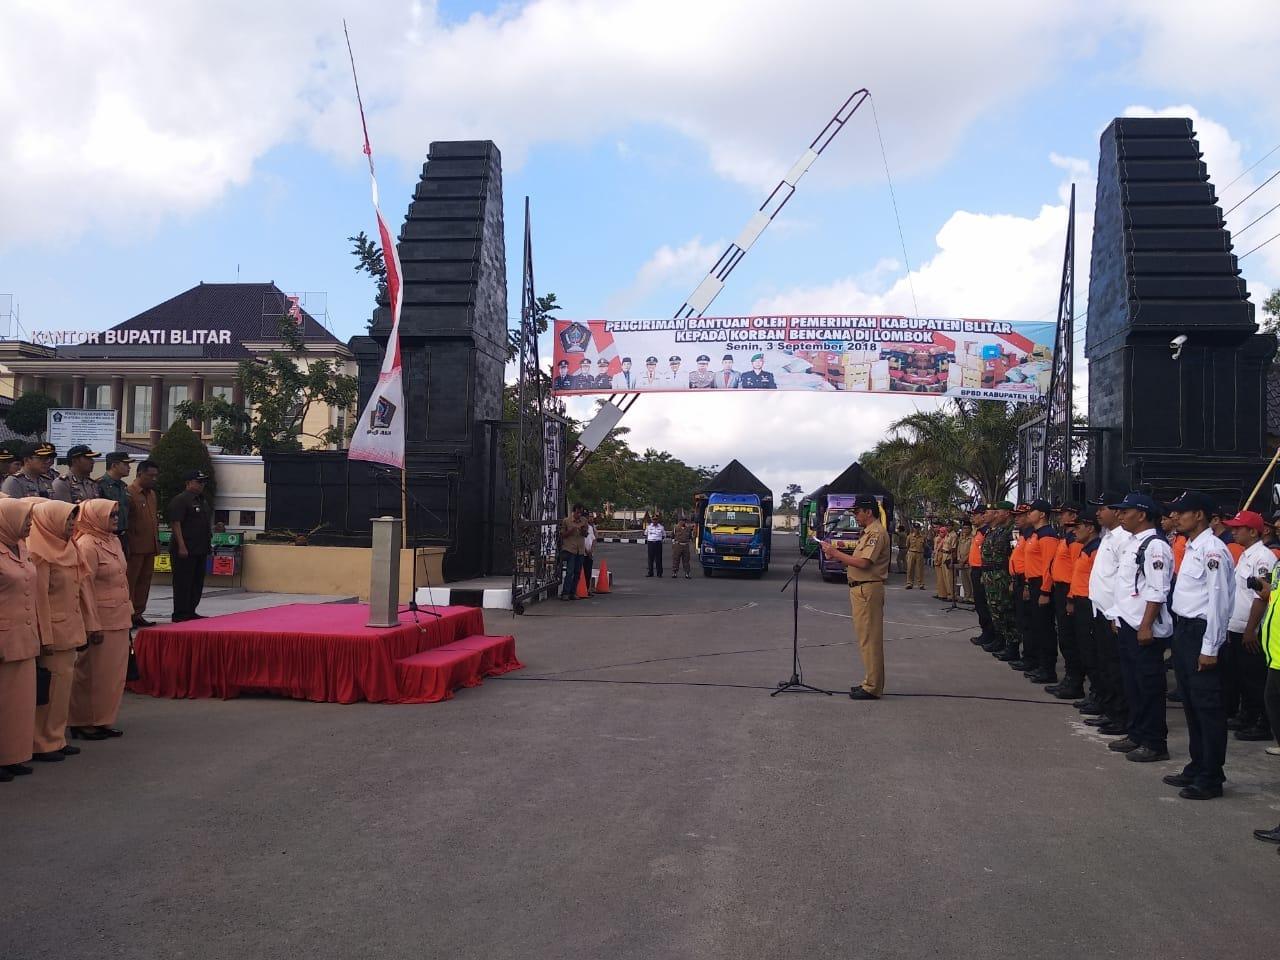 Bupati Blitar Rijanto memimpin upacara pemberangkatan armada bantuan ke Lombok Utara